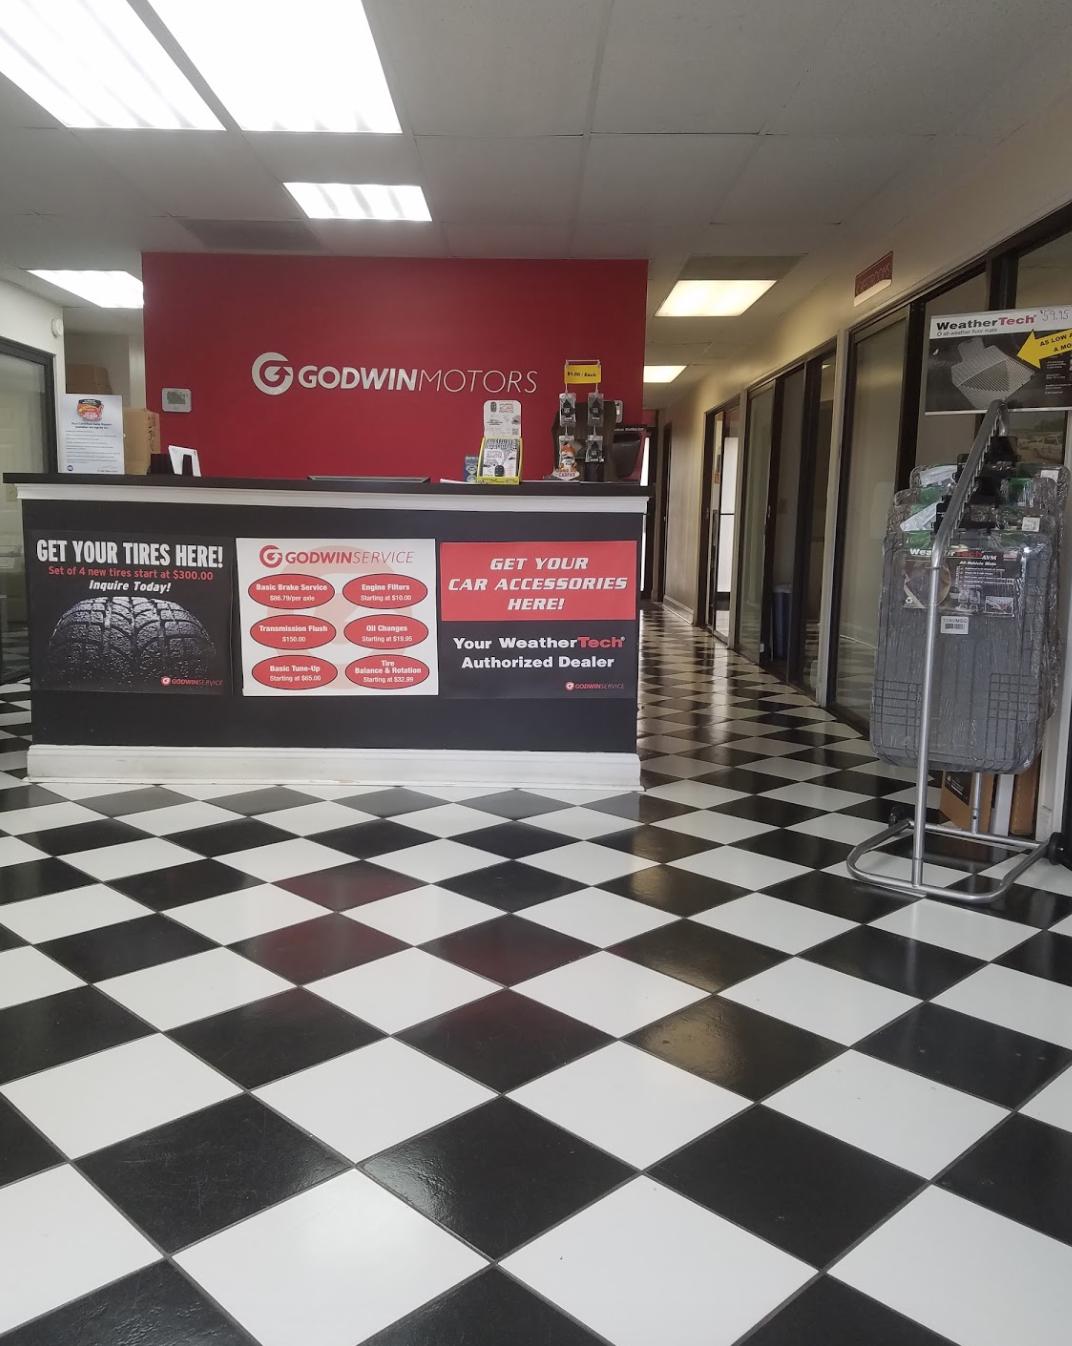 Godwin Motors   Automotive Service and Car Repair in